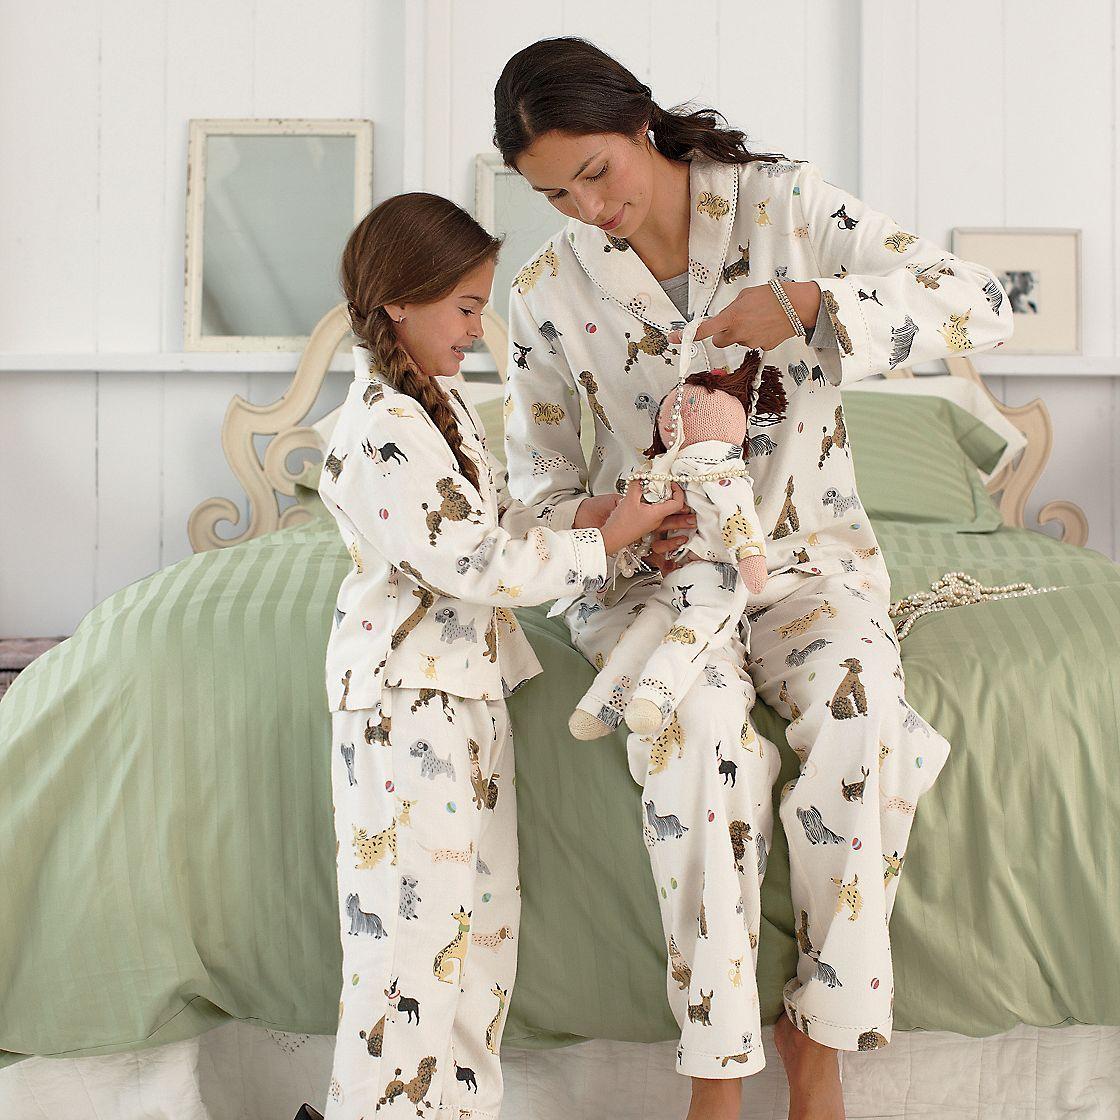 a094c28e2191 Dog Days Matching Mother Daughter Pajamas   Doll PJs